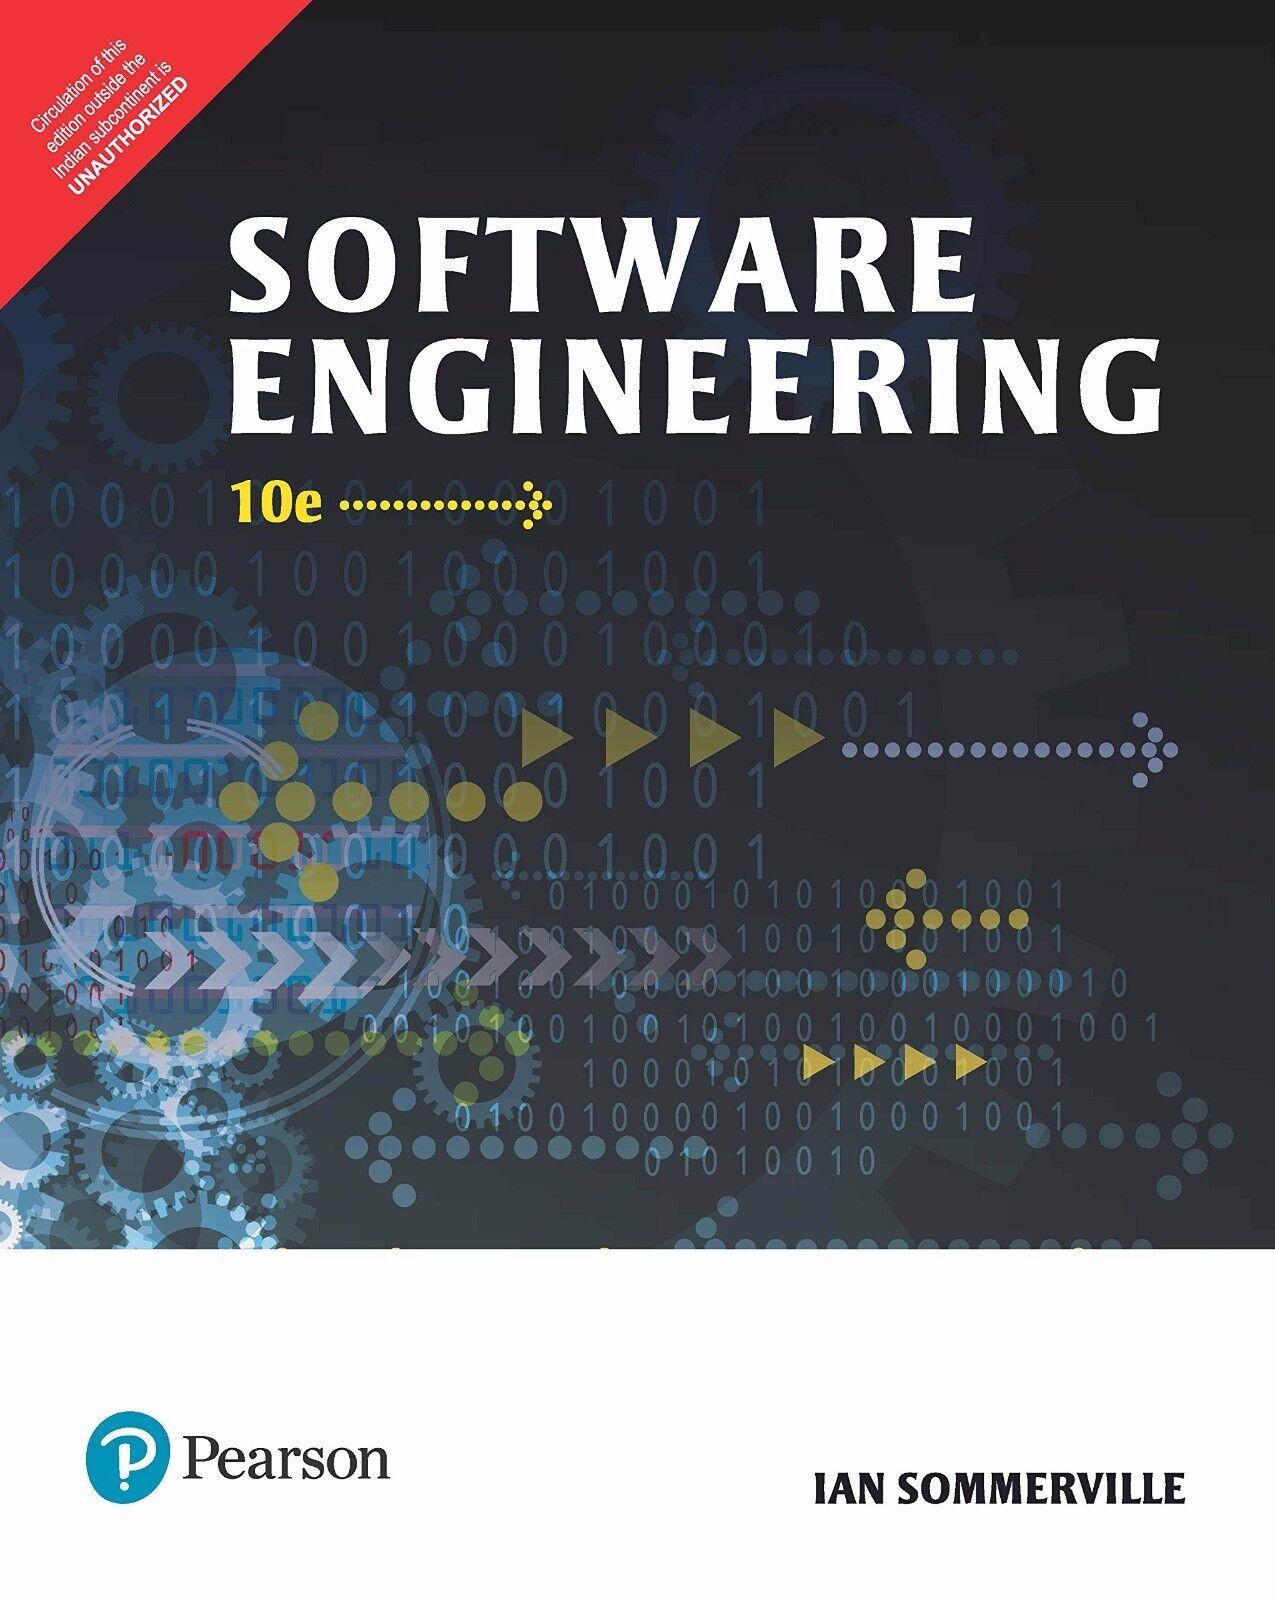 Software engineering by ian sommerville 2015 hardcover ebay resntentobalflowflowcomponentncel fandeluxe Gallery